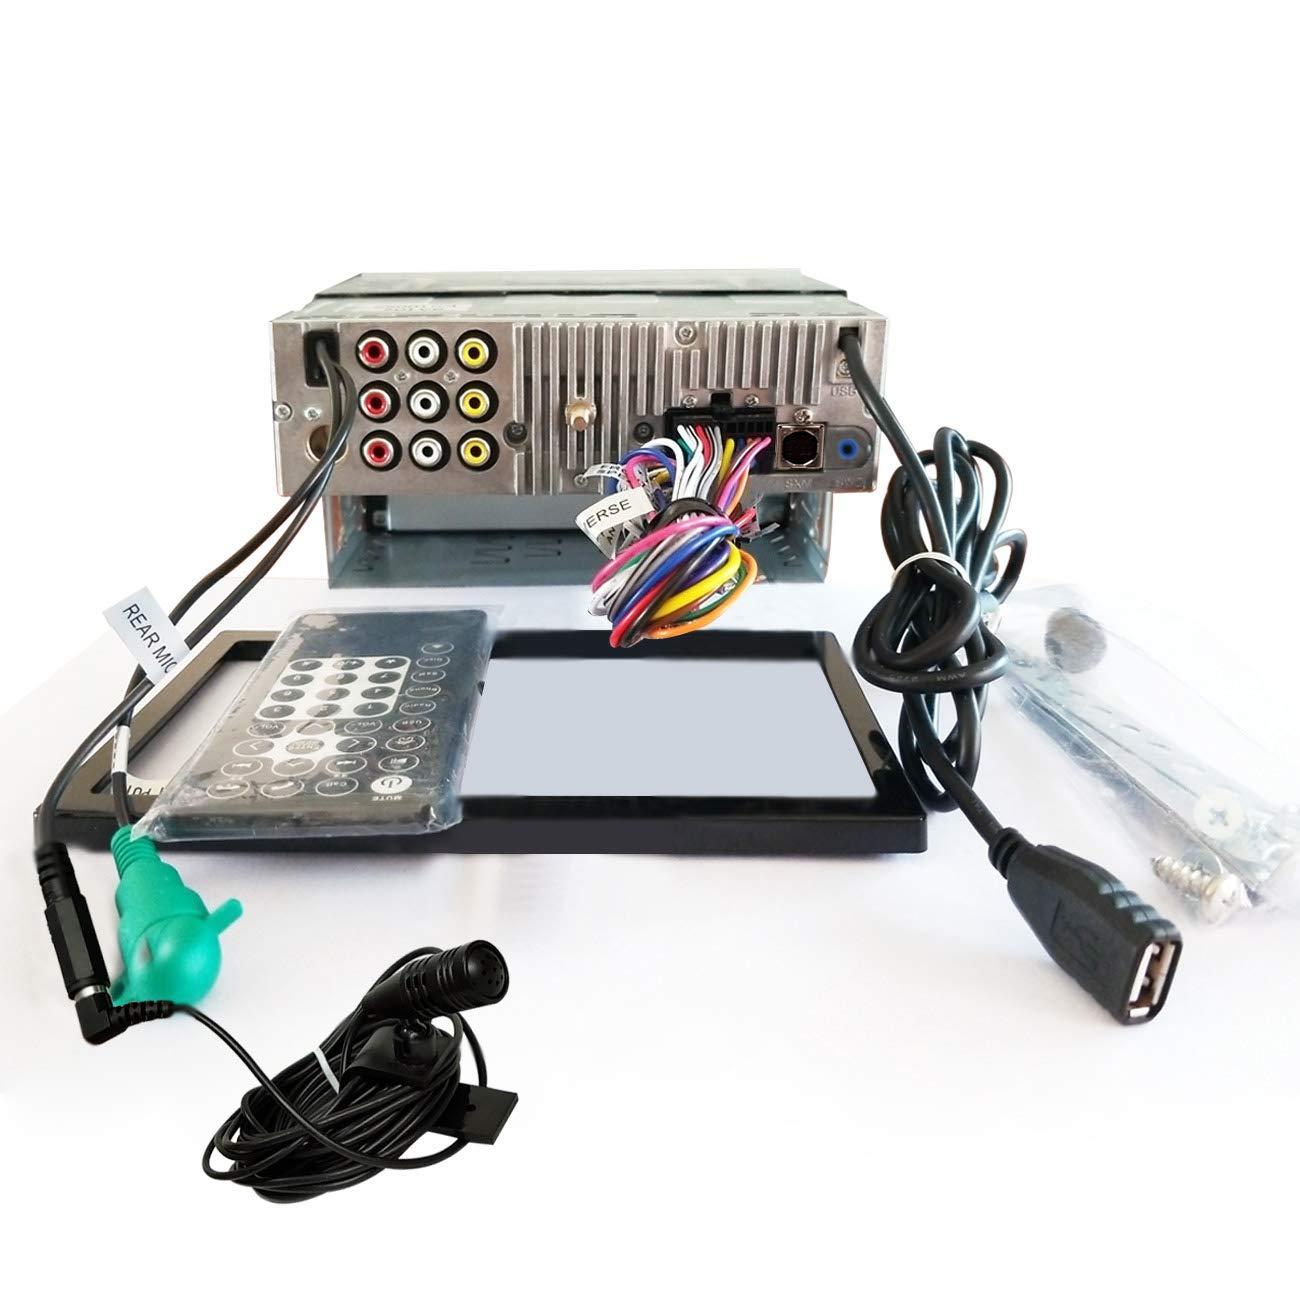 AM//FM Radio Tuner,USB Video /& Audio,and More AYUD701DA SA102 CarPlay /& Android Auto Receiver w//Bluetooth ATOTO Year Series in-Dash Digital Media Car Stereo